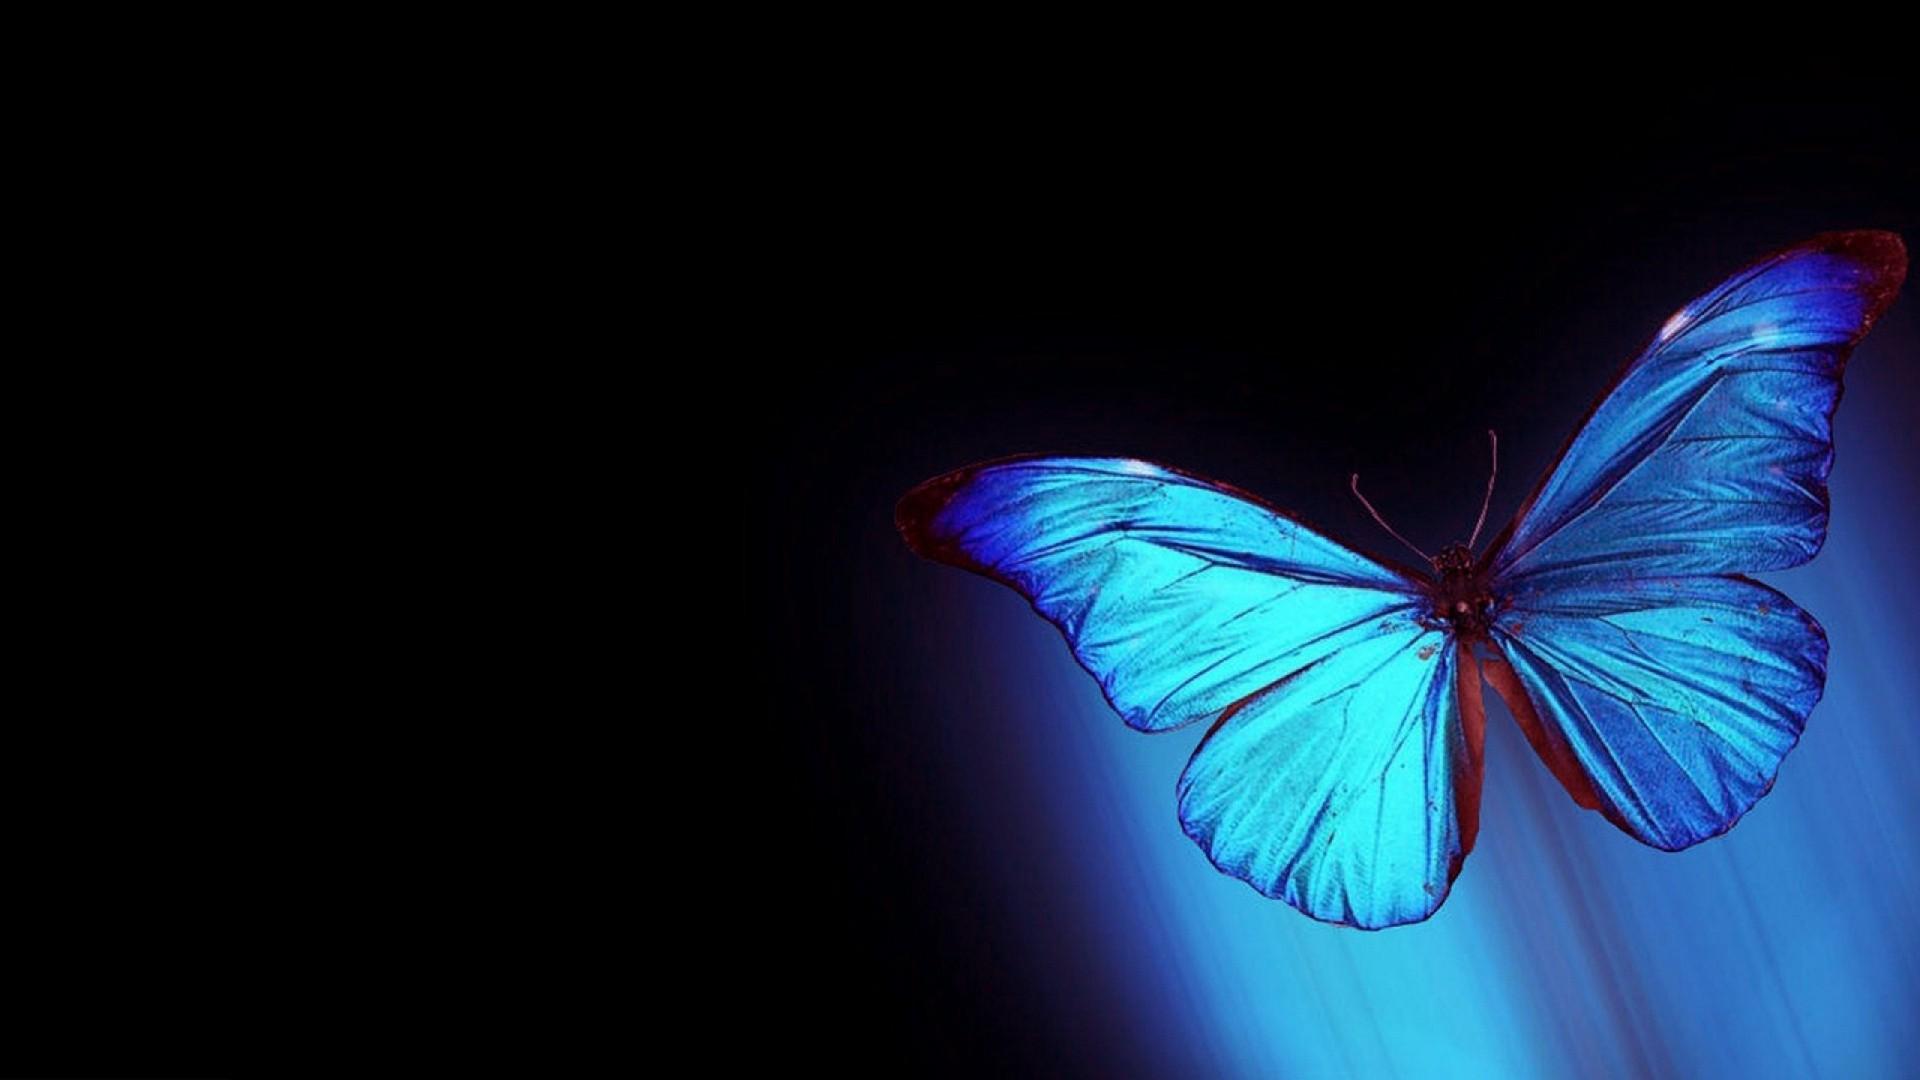 Blue Butterfly Wallpaper Picture hd